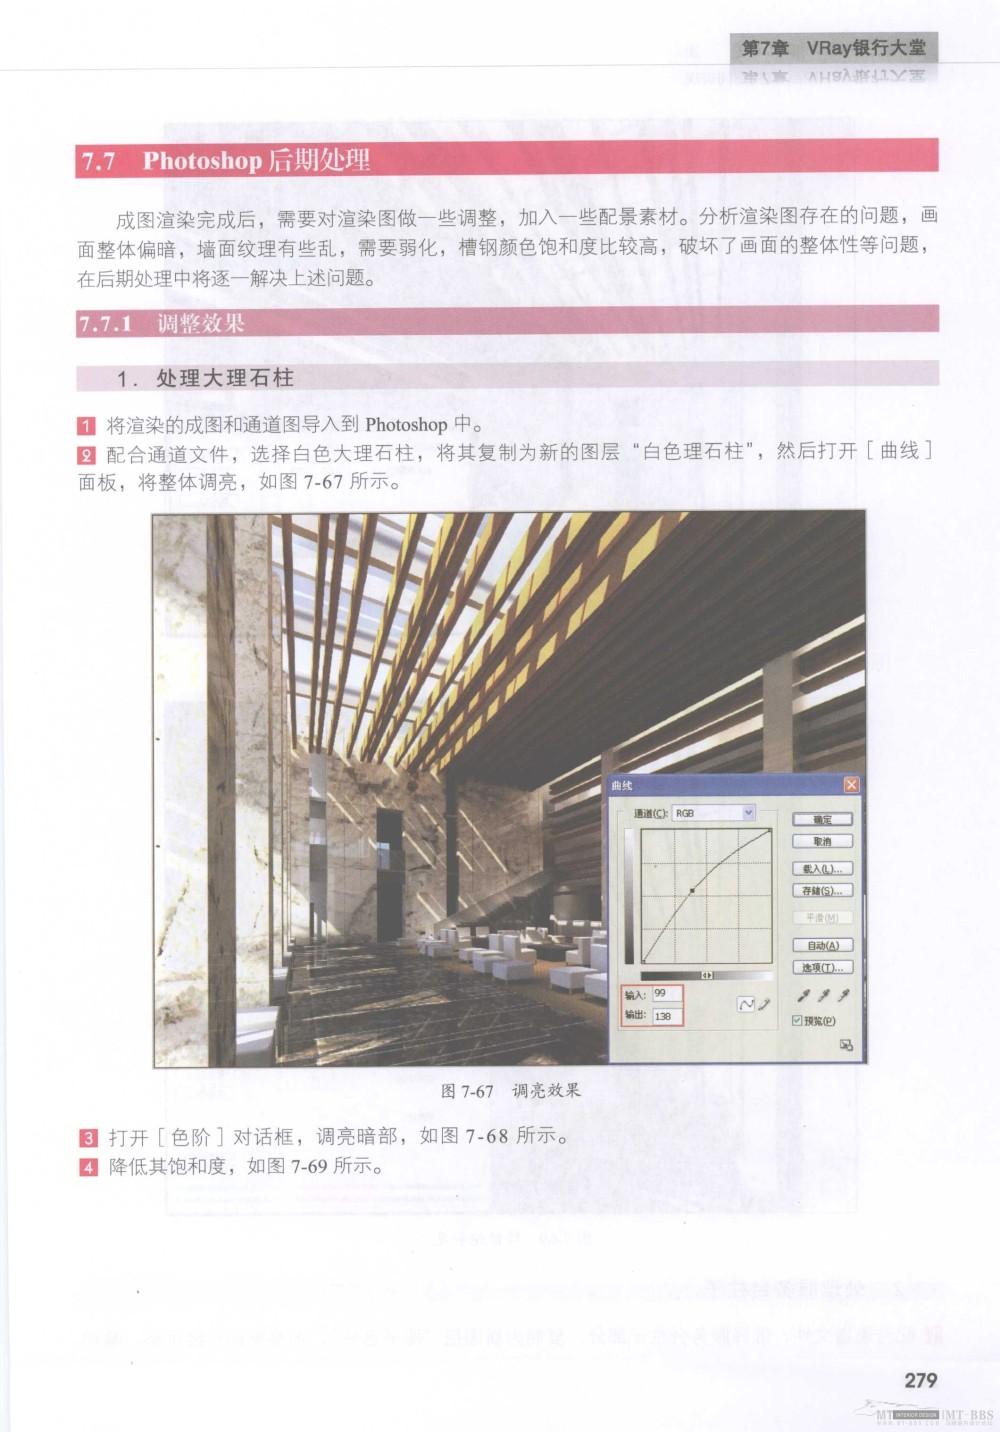 水晶石技法-3ds_Max&VRay室内空间表现_水晶石技法-3ds_Max&VRay室内空间表现_页面_285.jpg